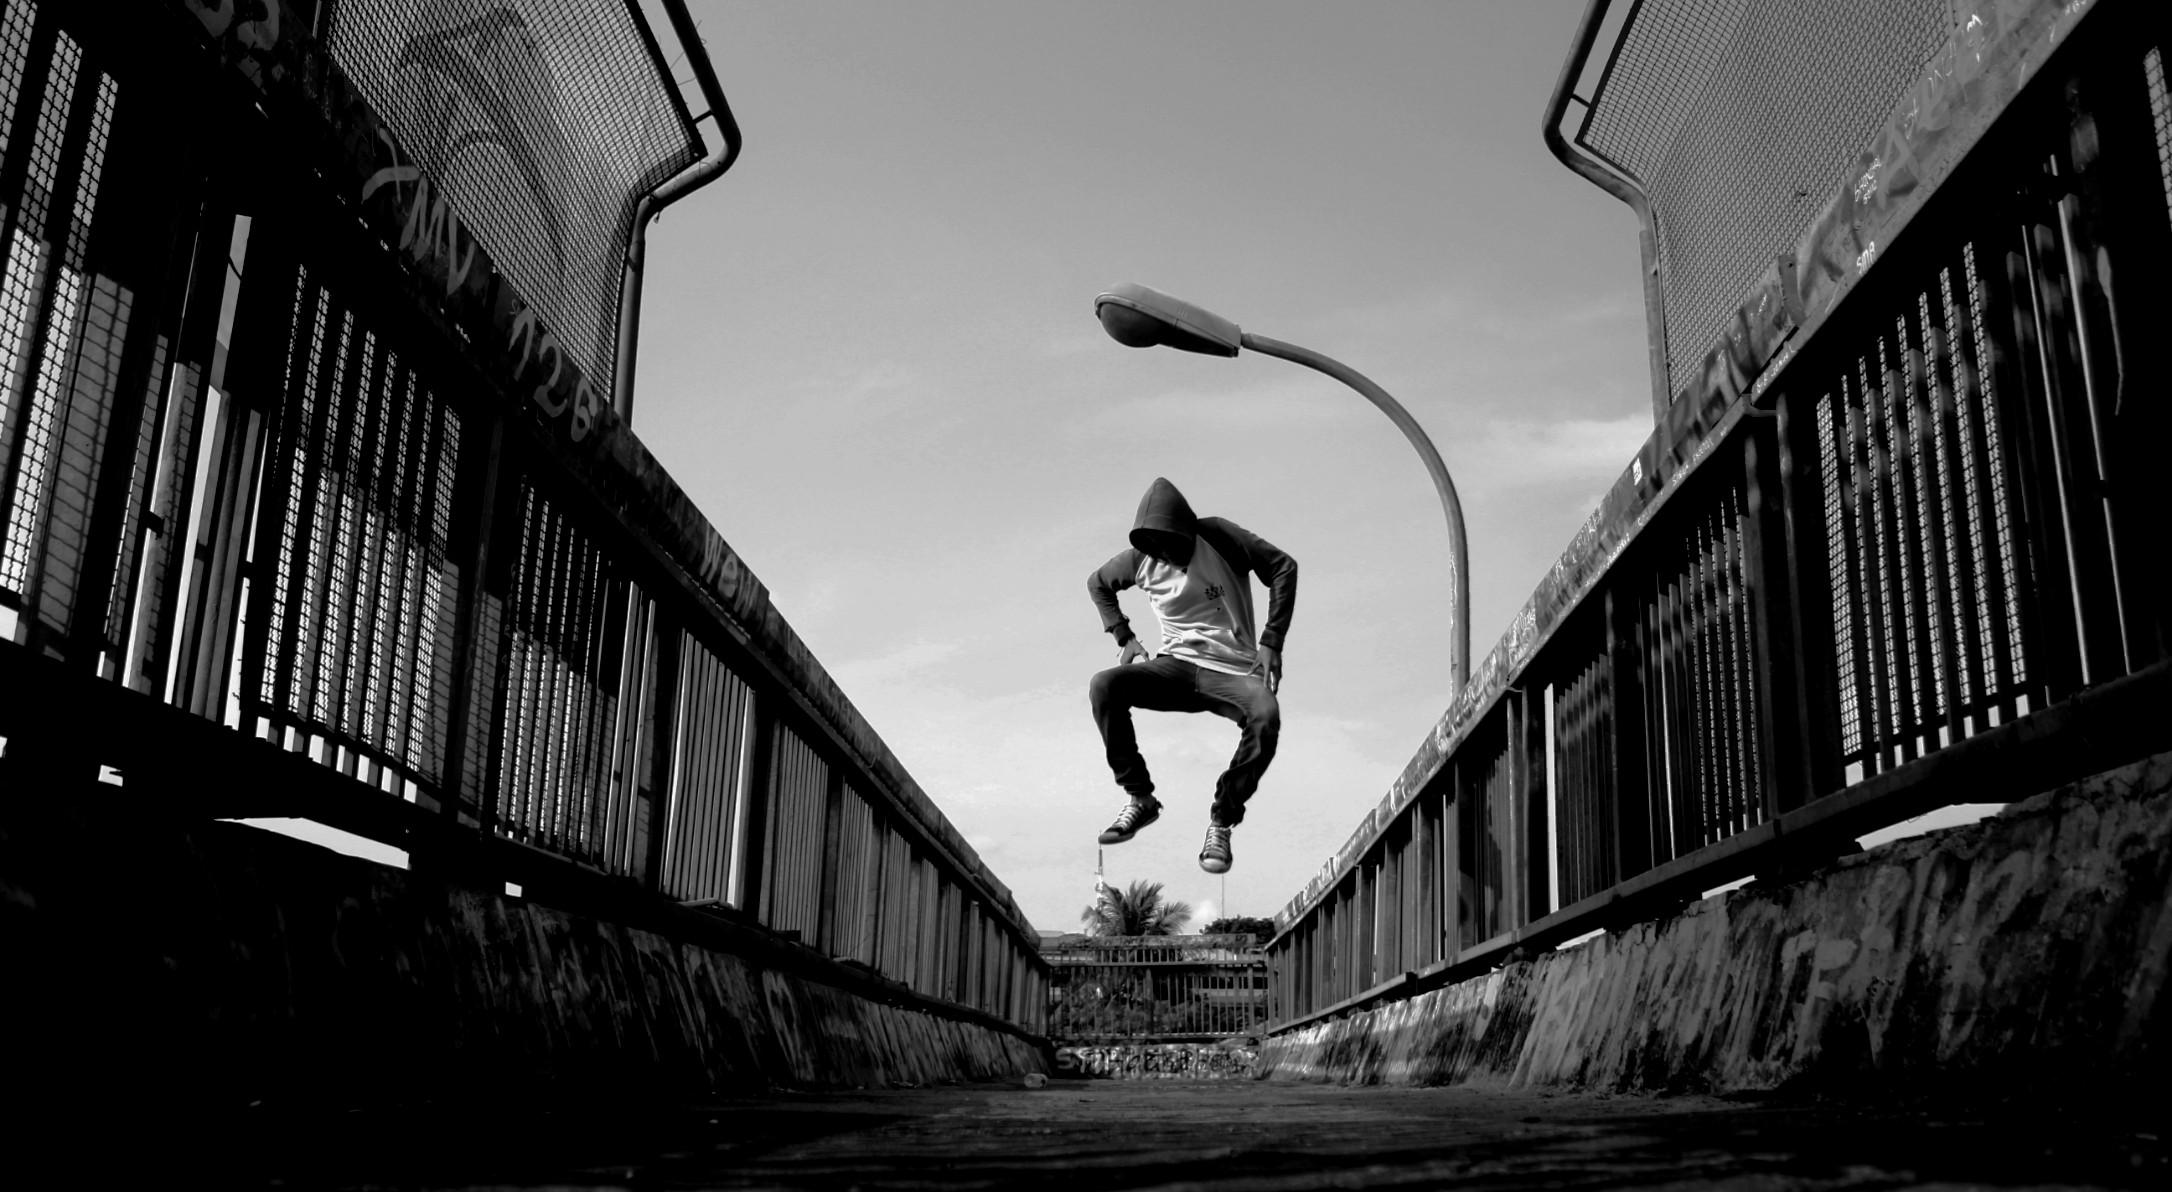 Black Cat Wallpaper Man Jumping On Air Wearing Gray Hoodie 183 Free Stock Photo